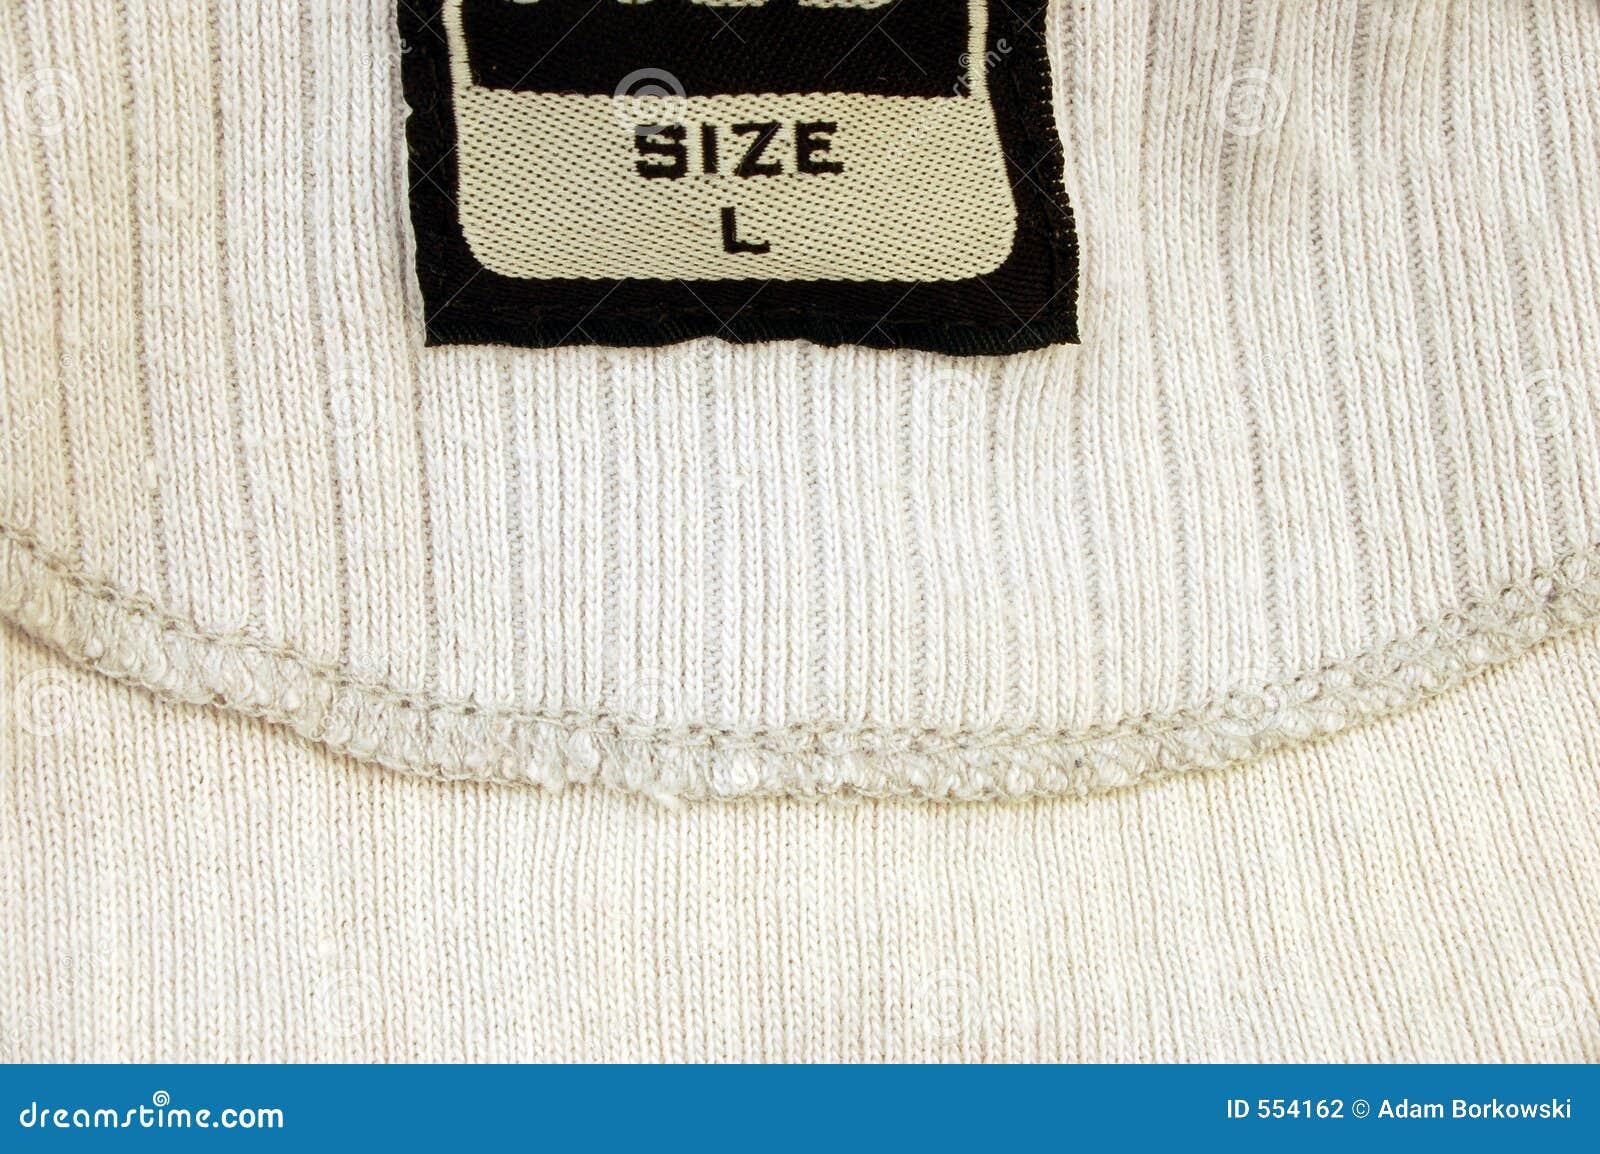 Media (L) camisa do tamanho